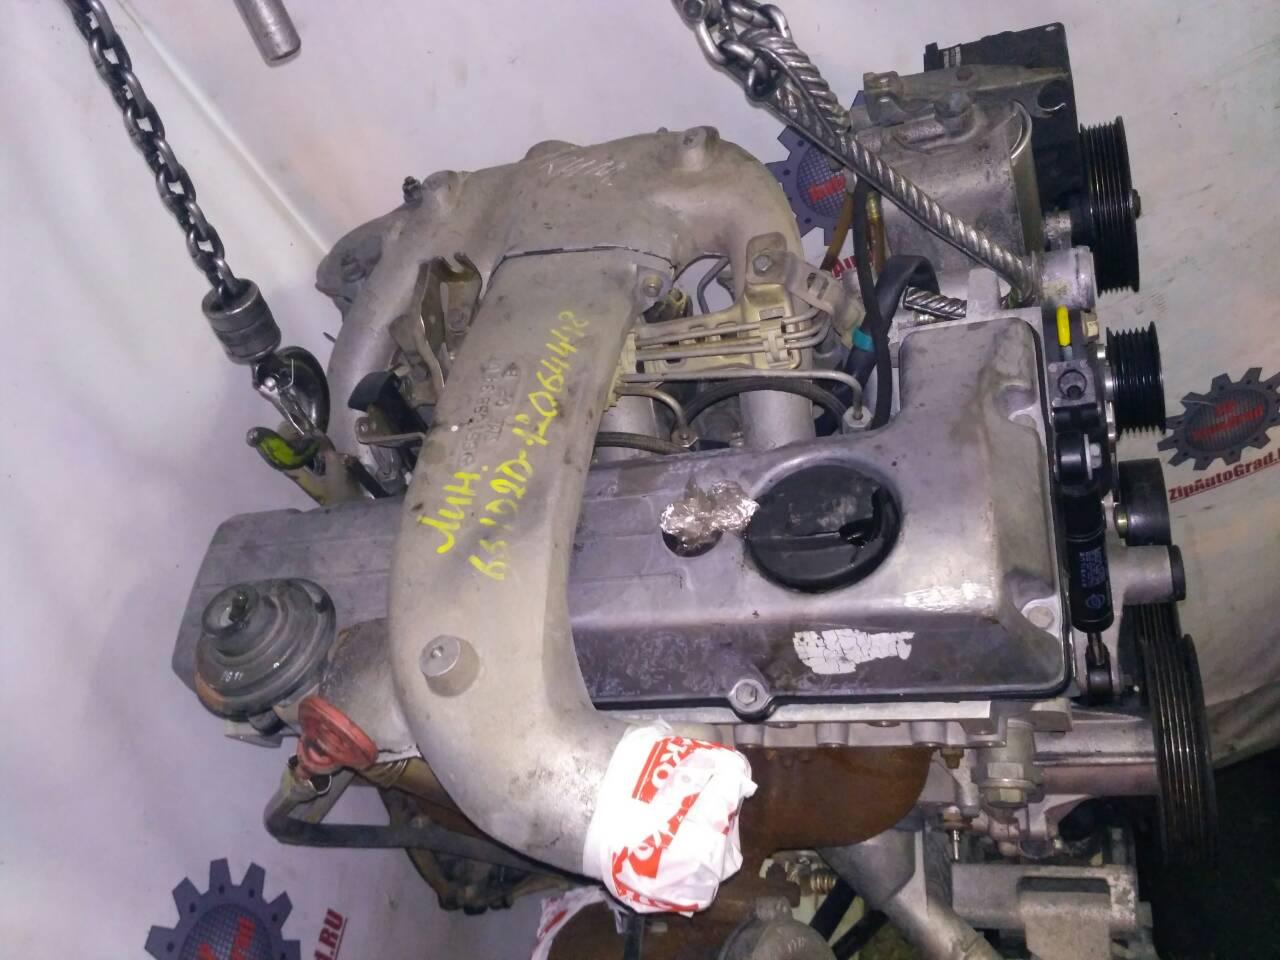 Двигатель Tagaz Tager. 661920. , 2.3л., 79л.с.  фото 4